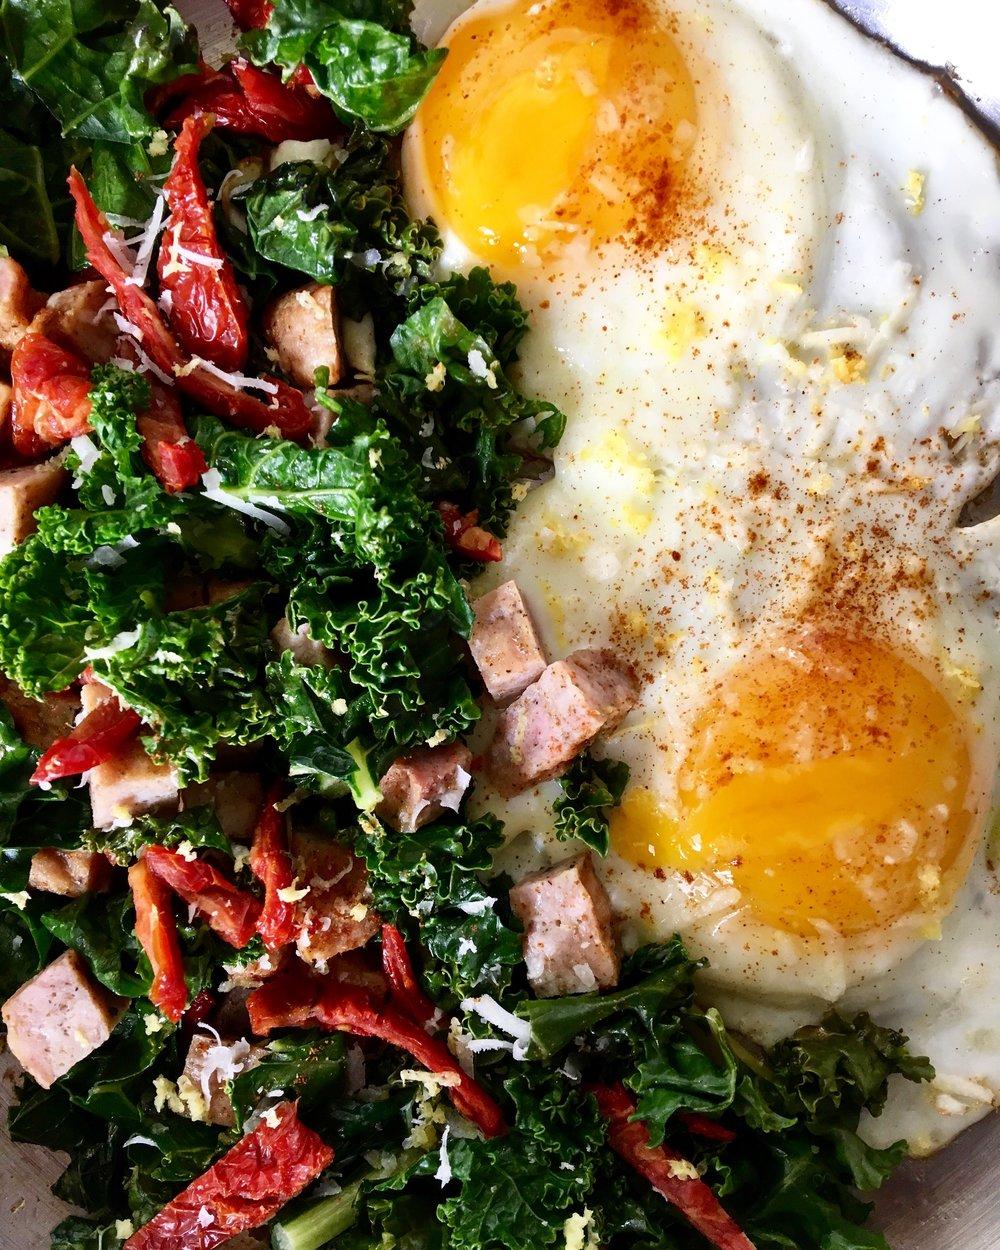 Sunnyside Up / Mixed Kale, Collard + Chard / Sun dried Tomato / Chicken Sausage